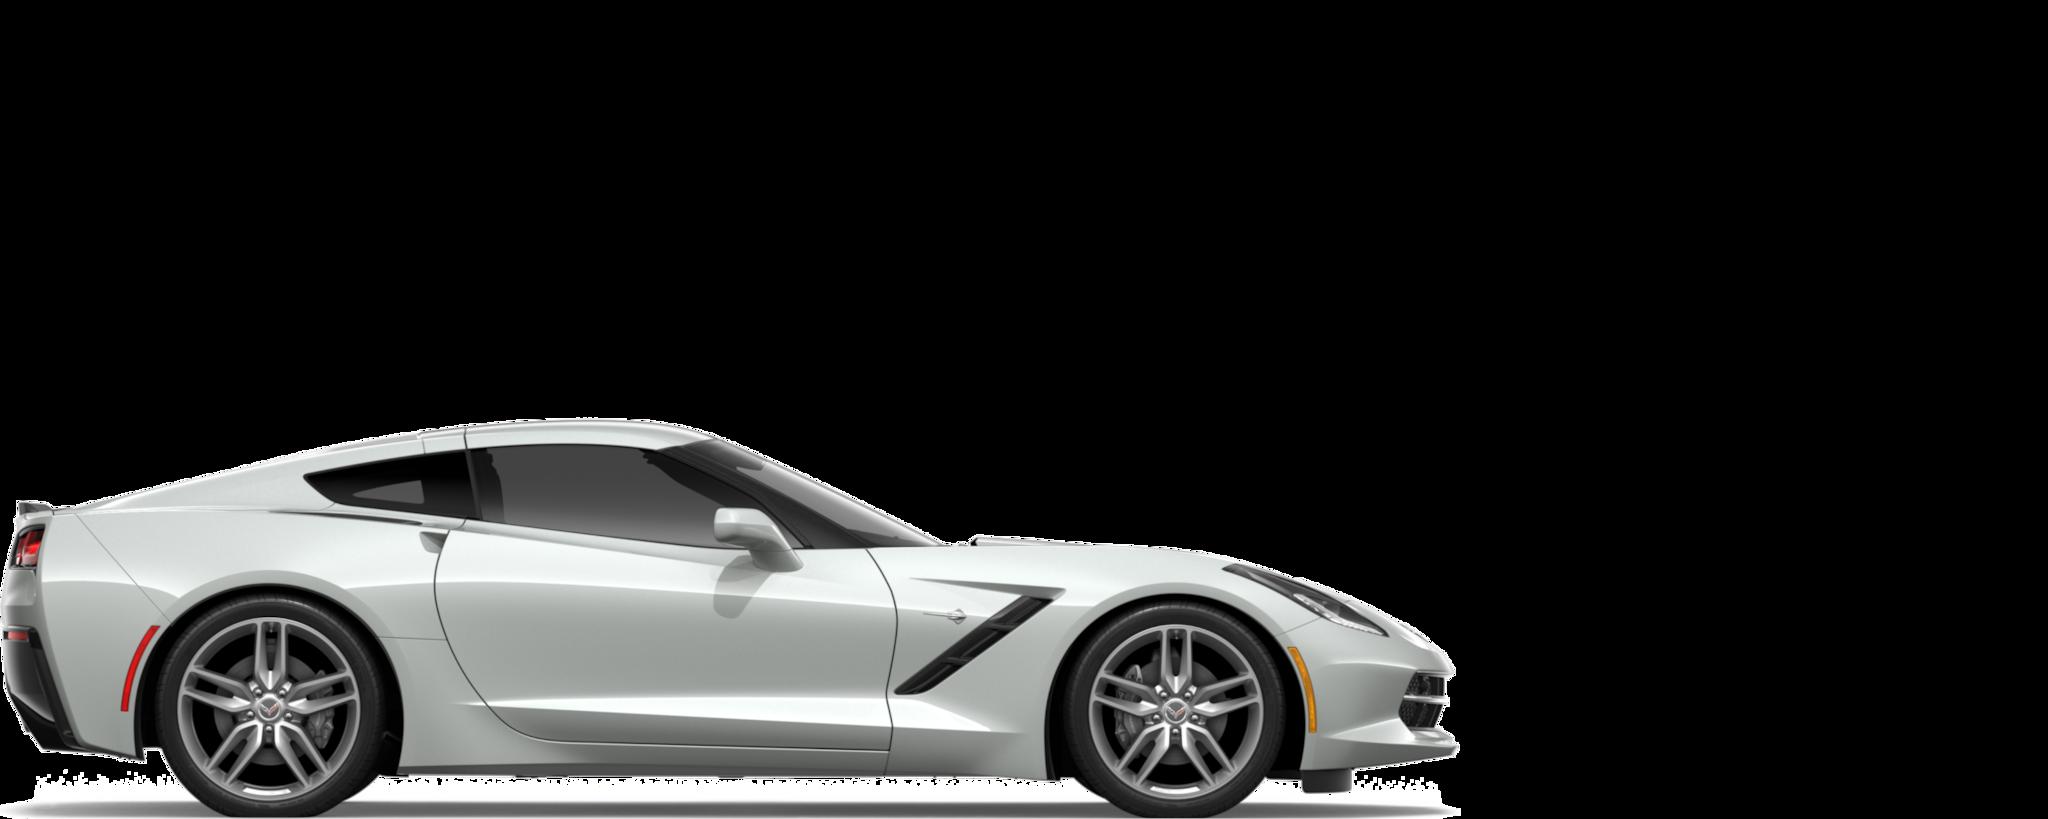 Corvette Stingray 2019